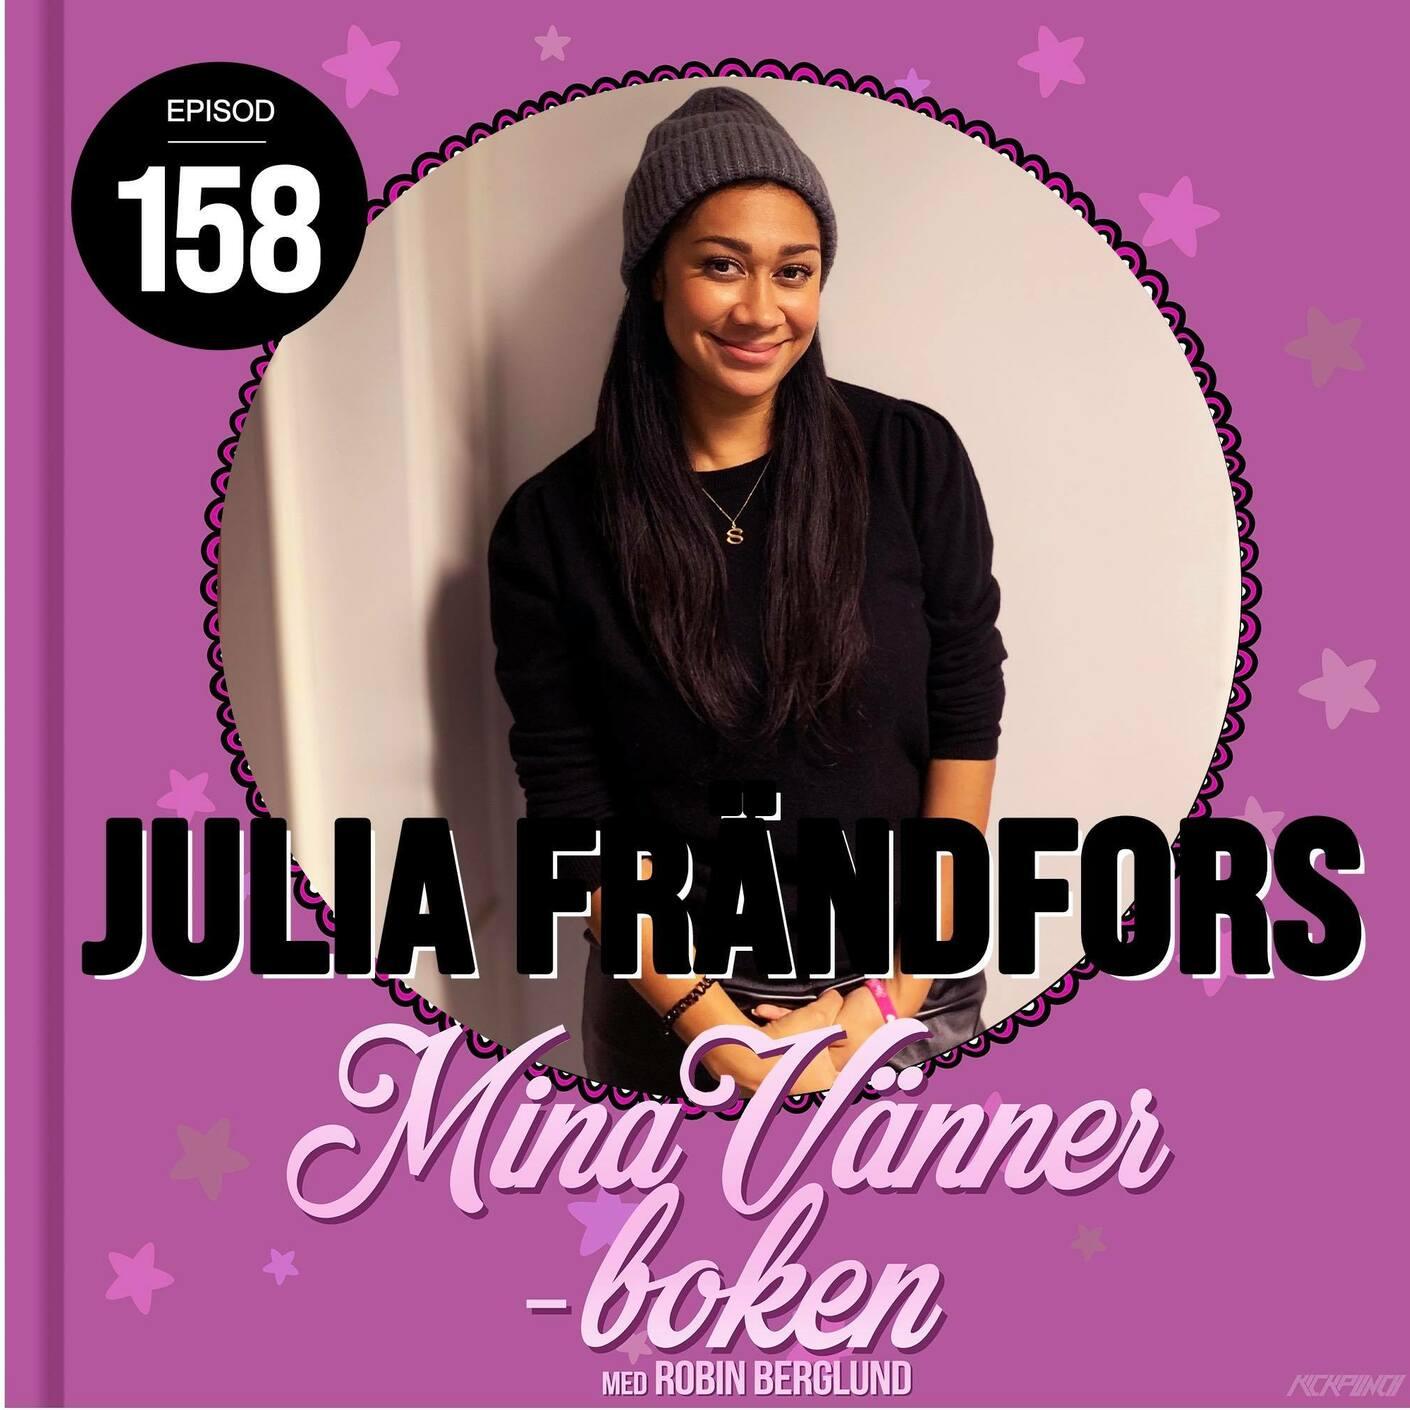 158. Julia Frändfors